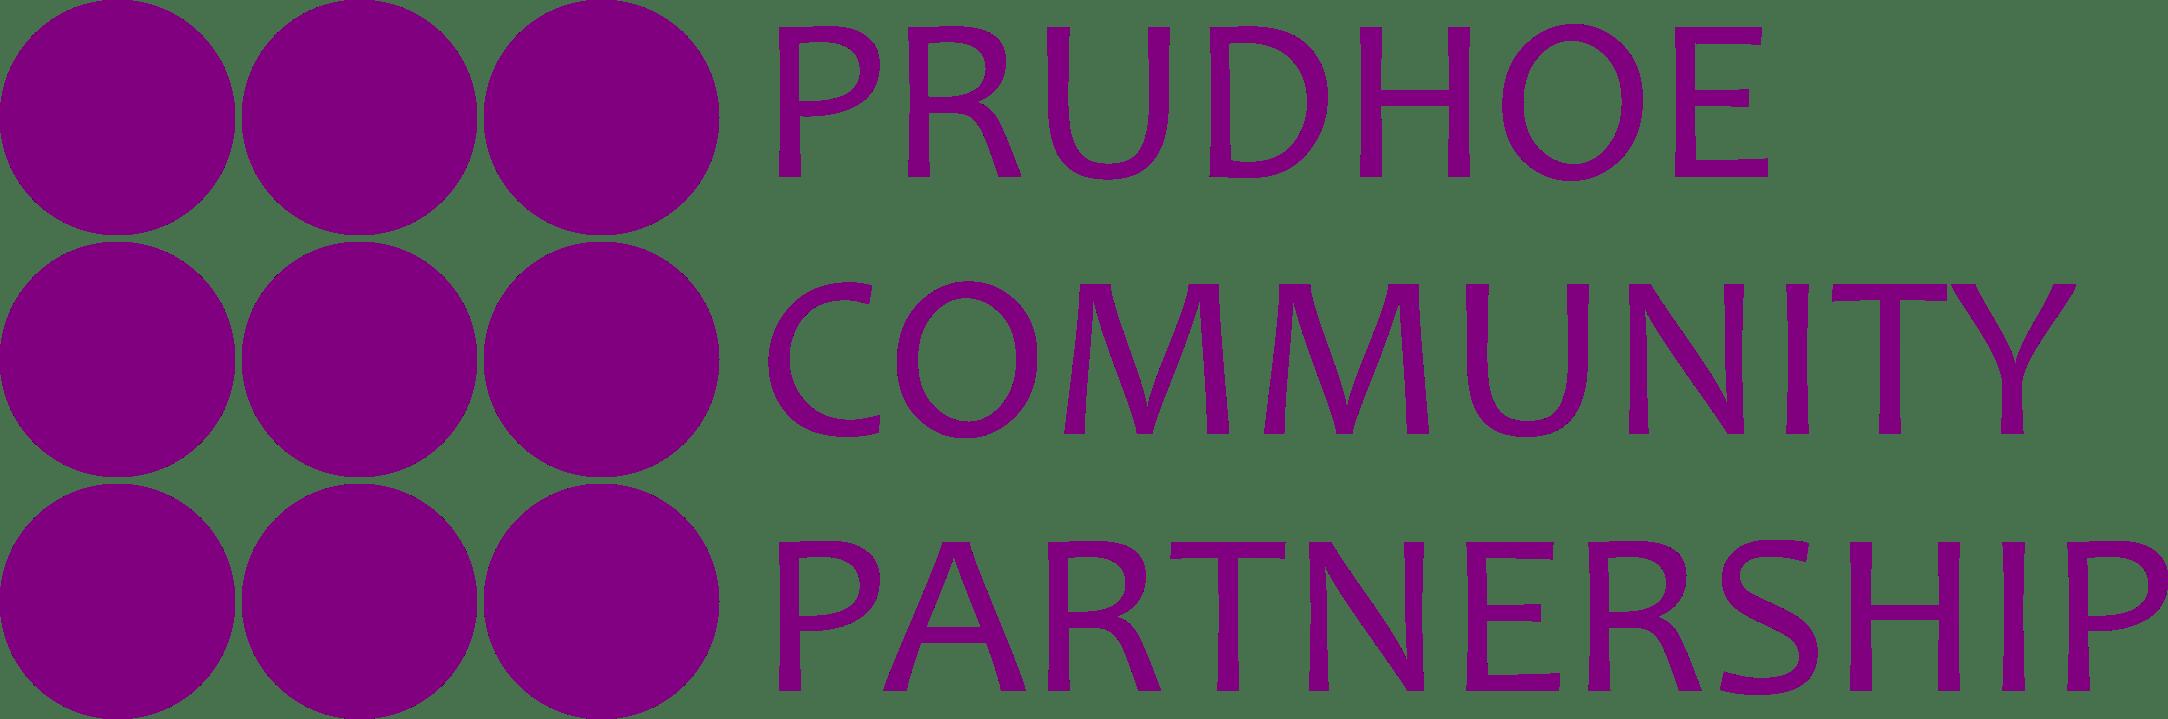 Prudhoe Community Partnership